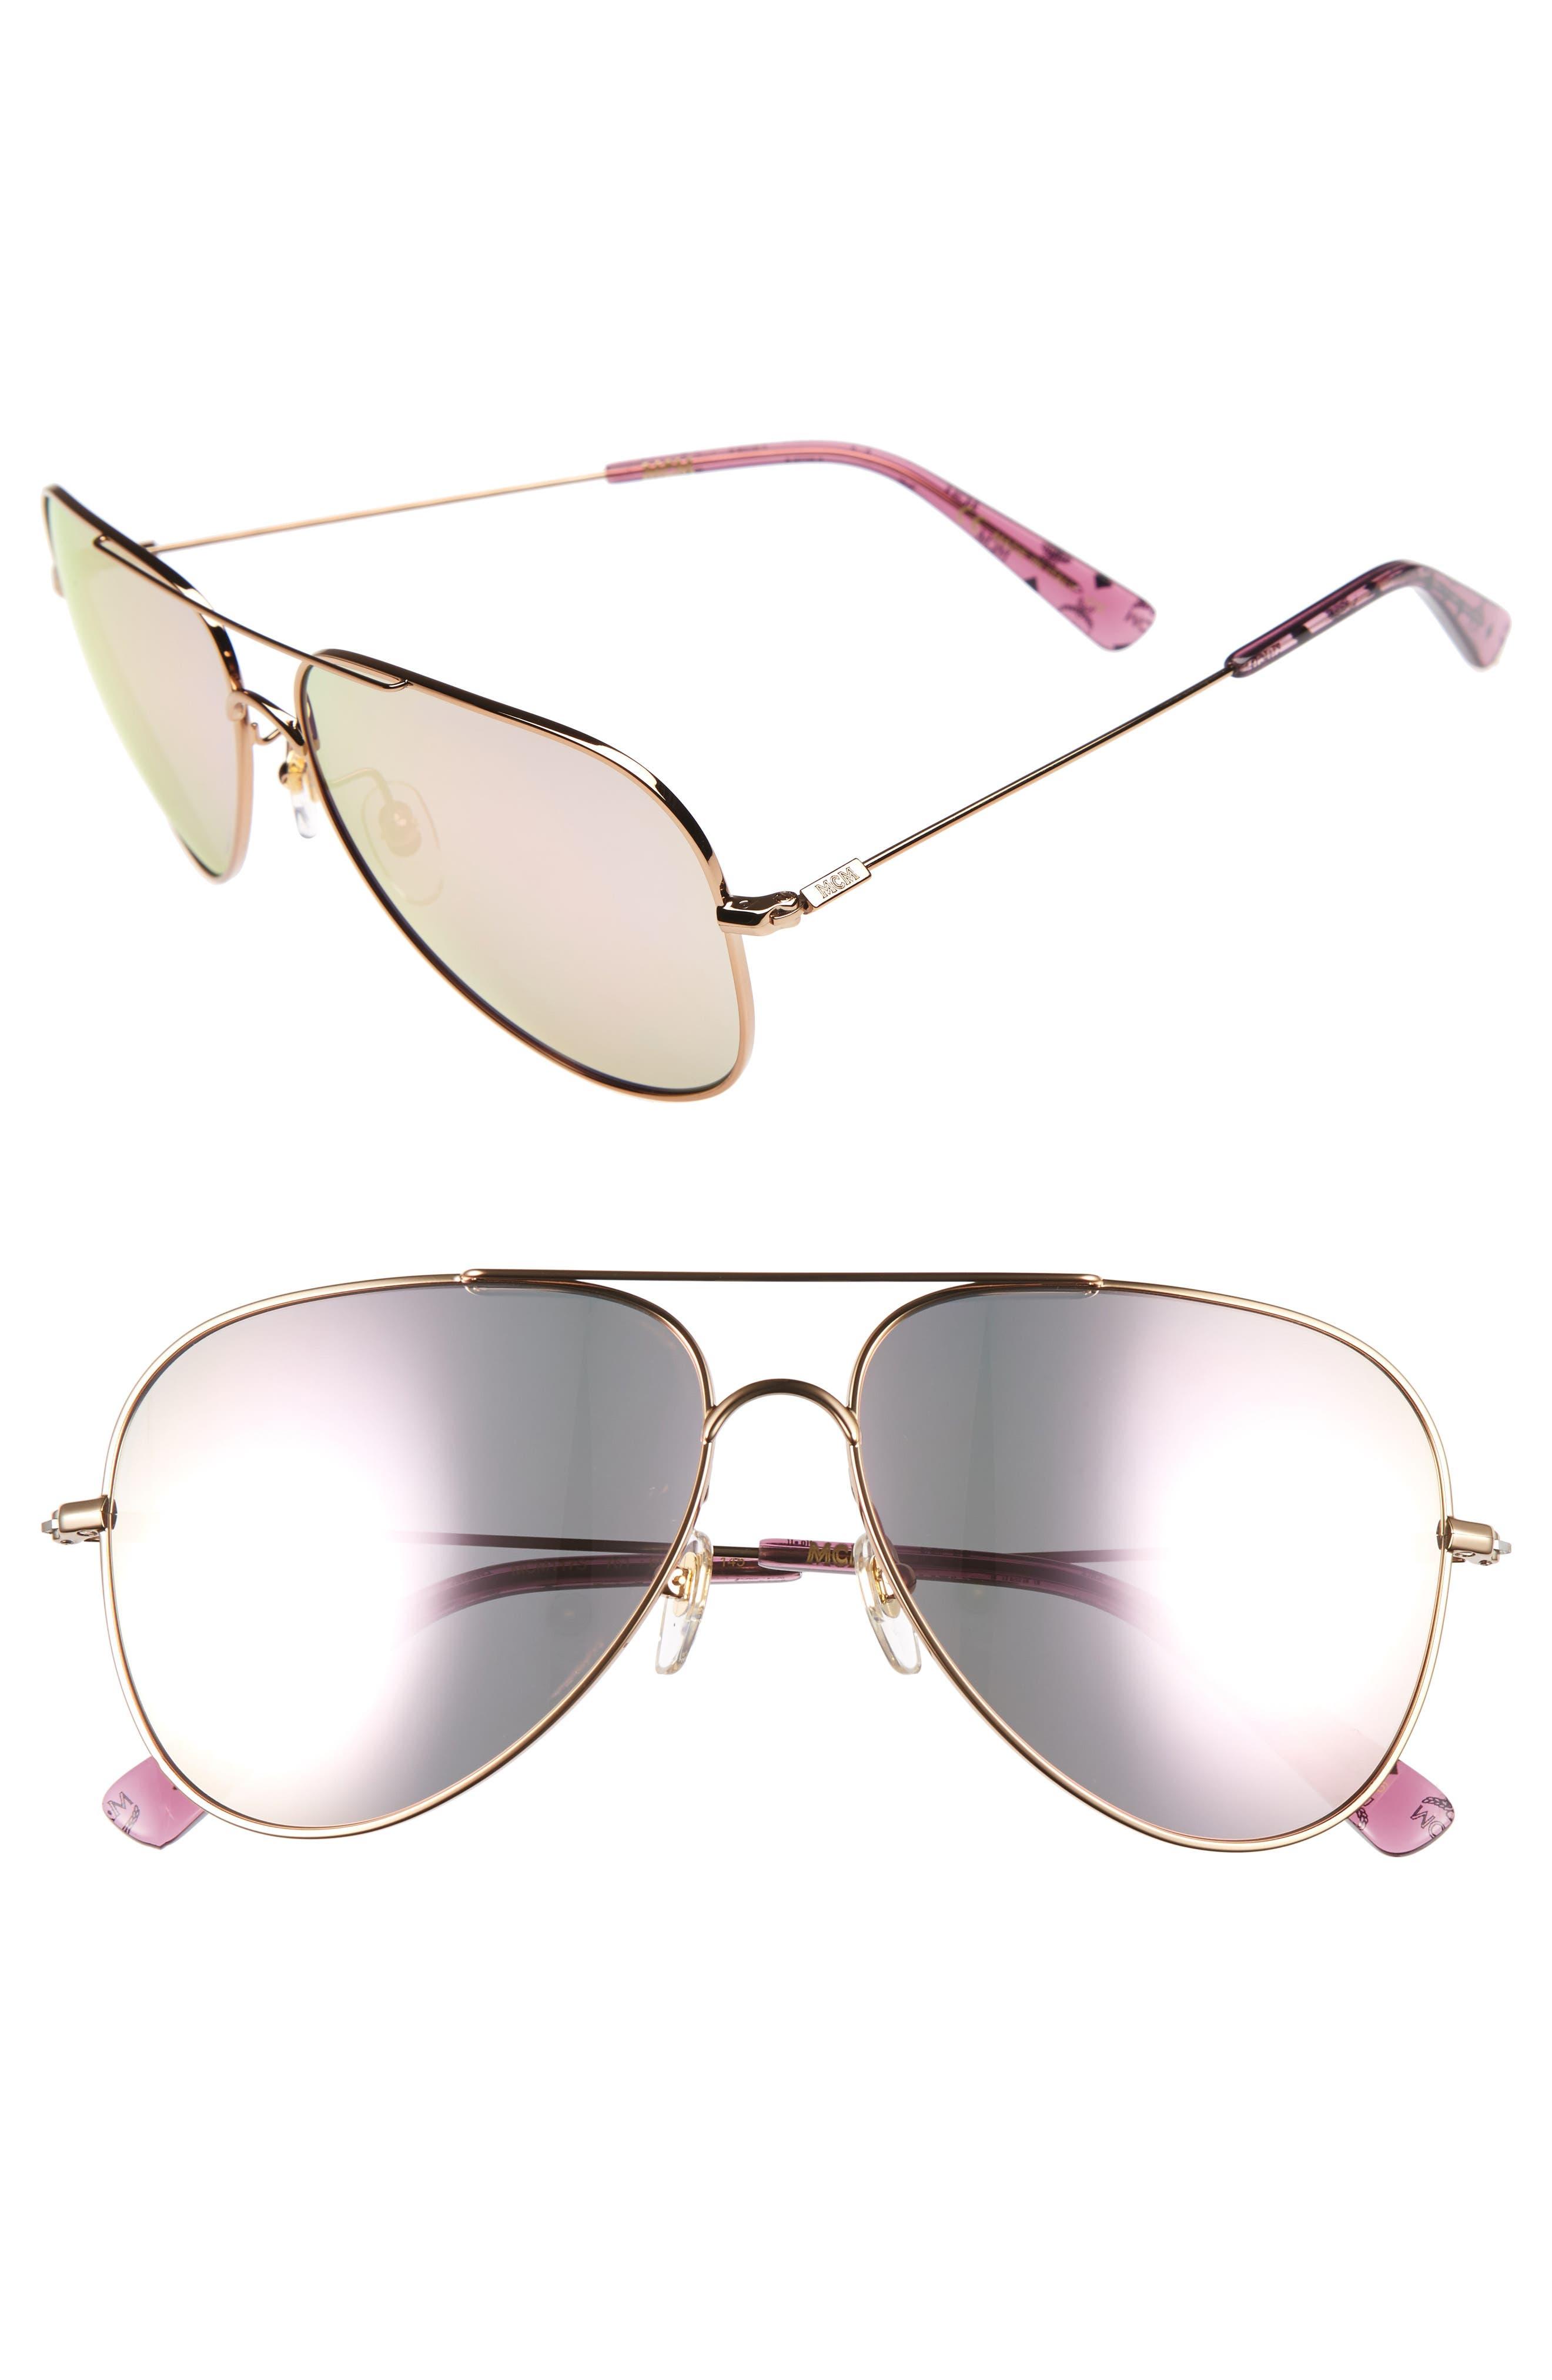 60mm Aviator Sunglasses,                         Main,                         color, AMBER